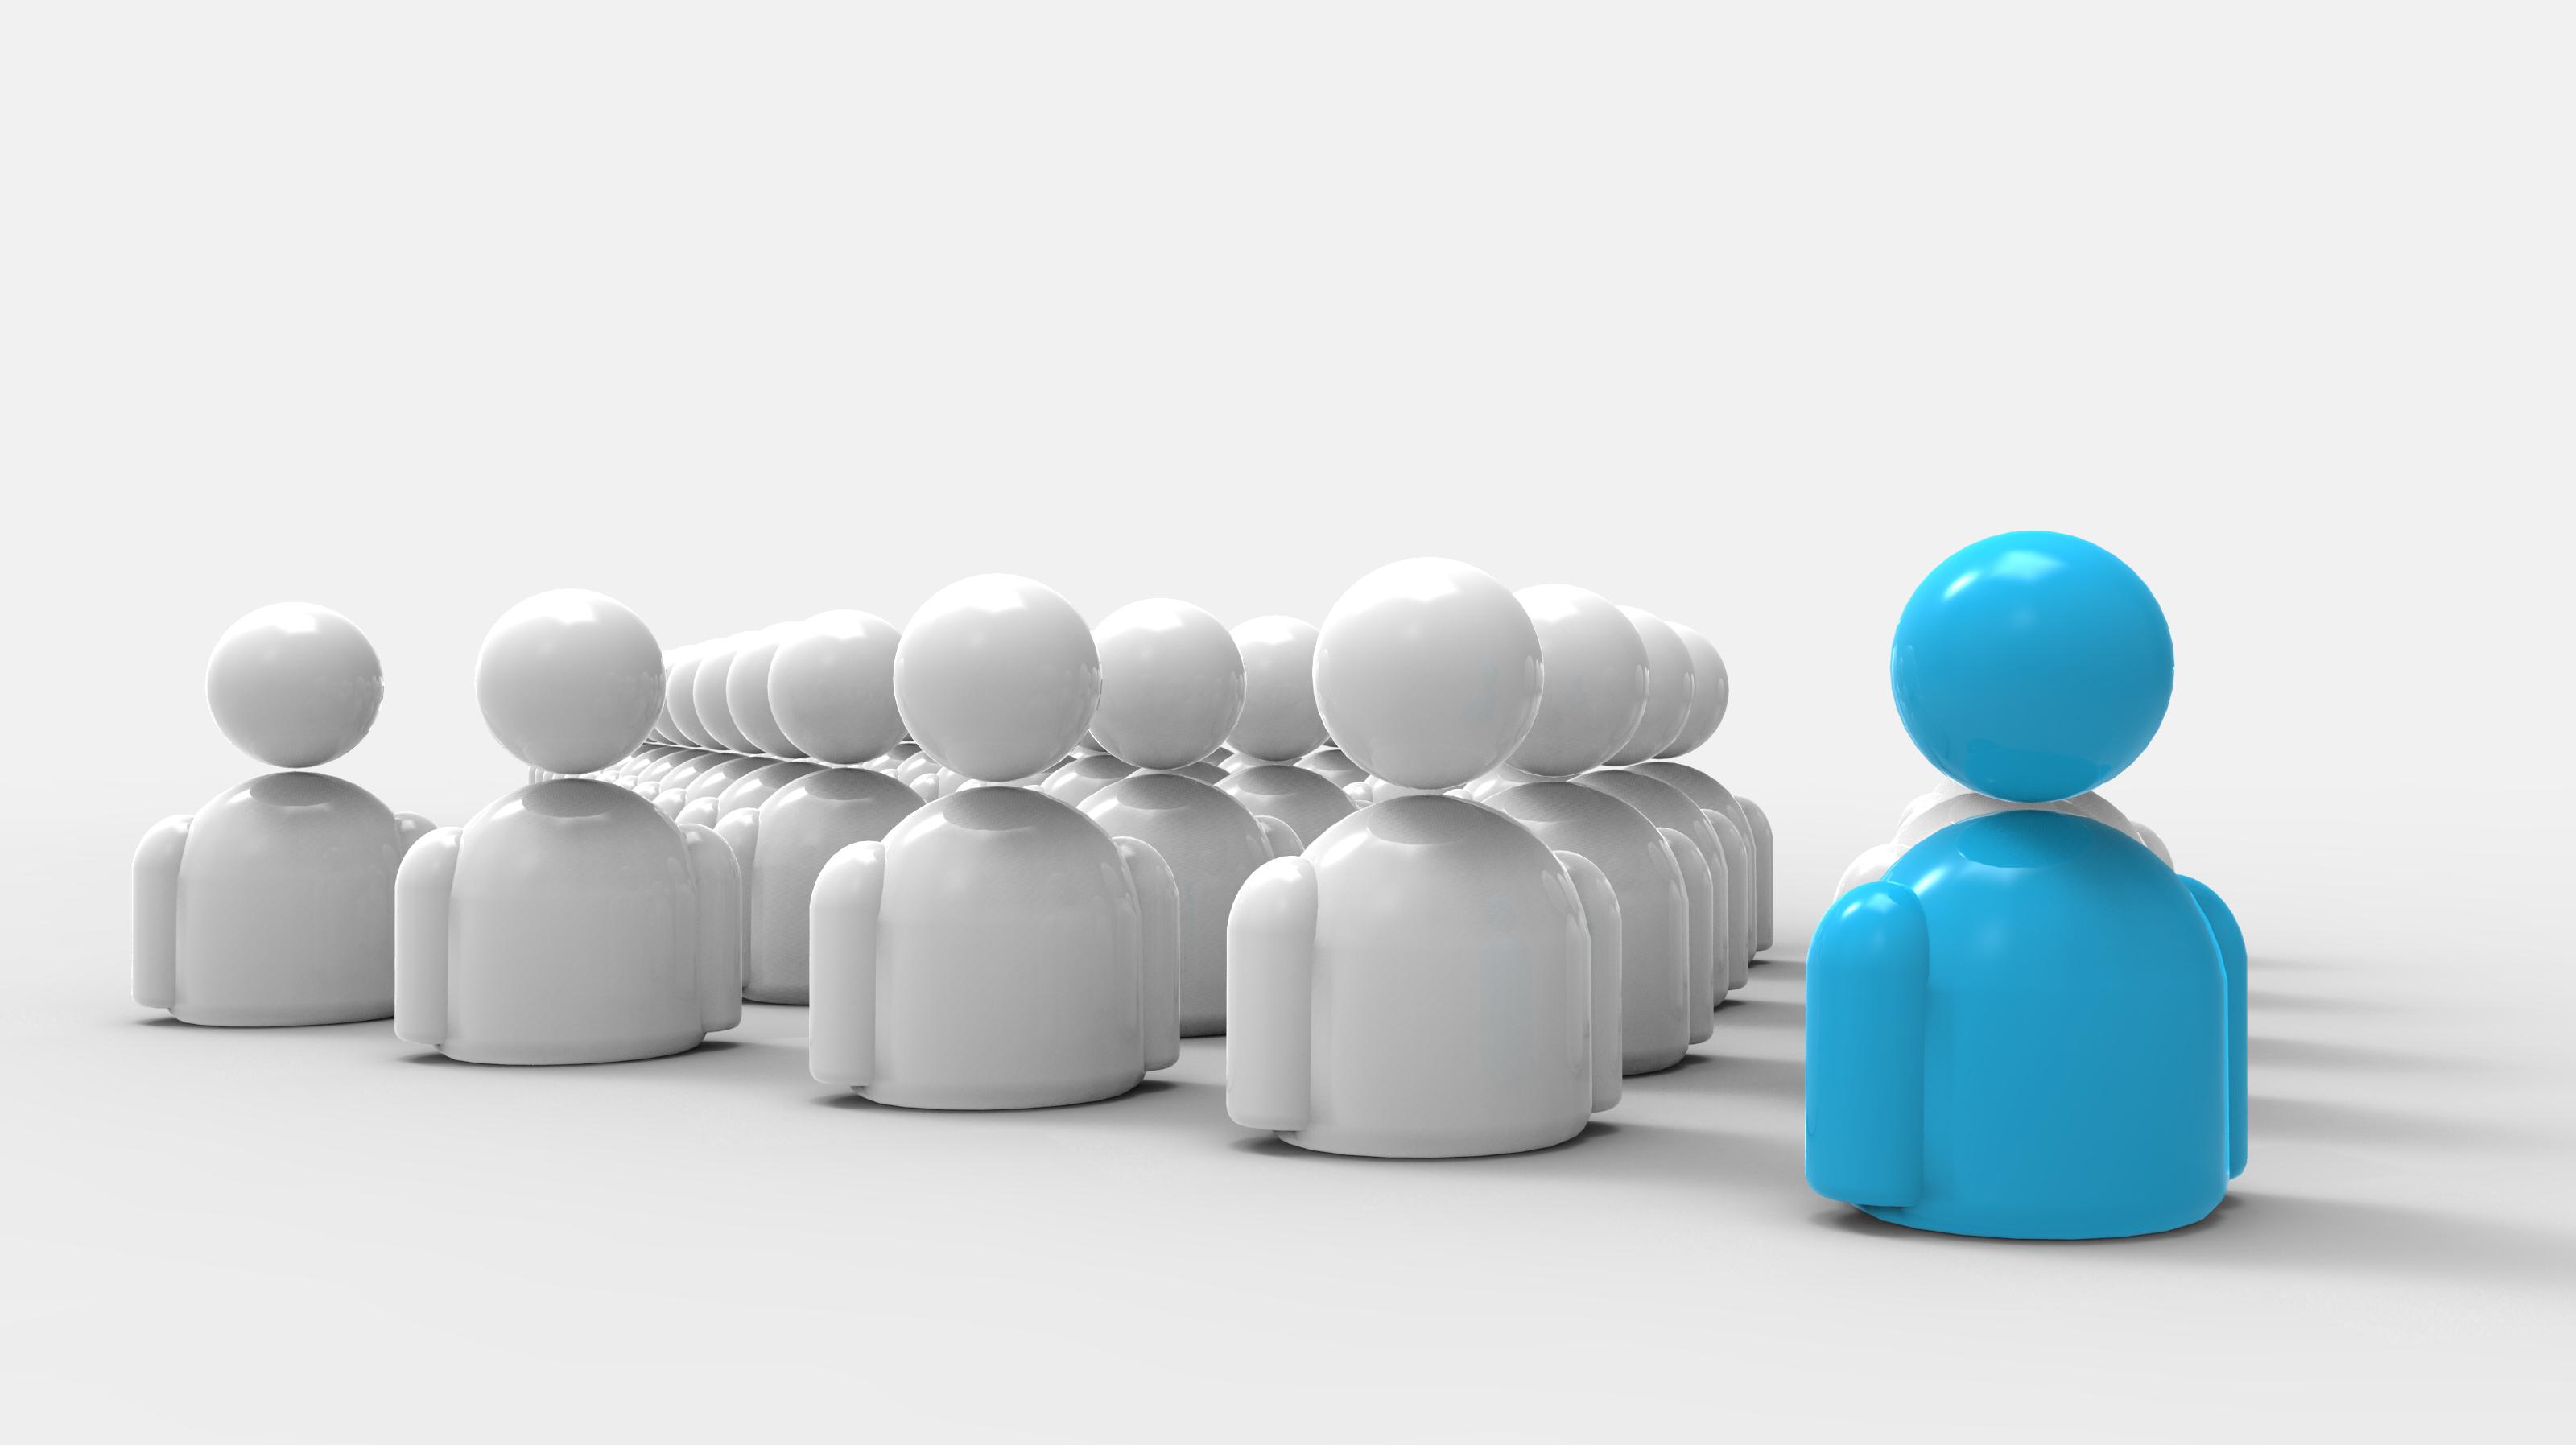 Plan de negocios - Aspectos corporativos